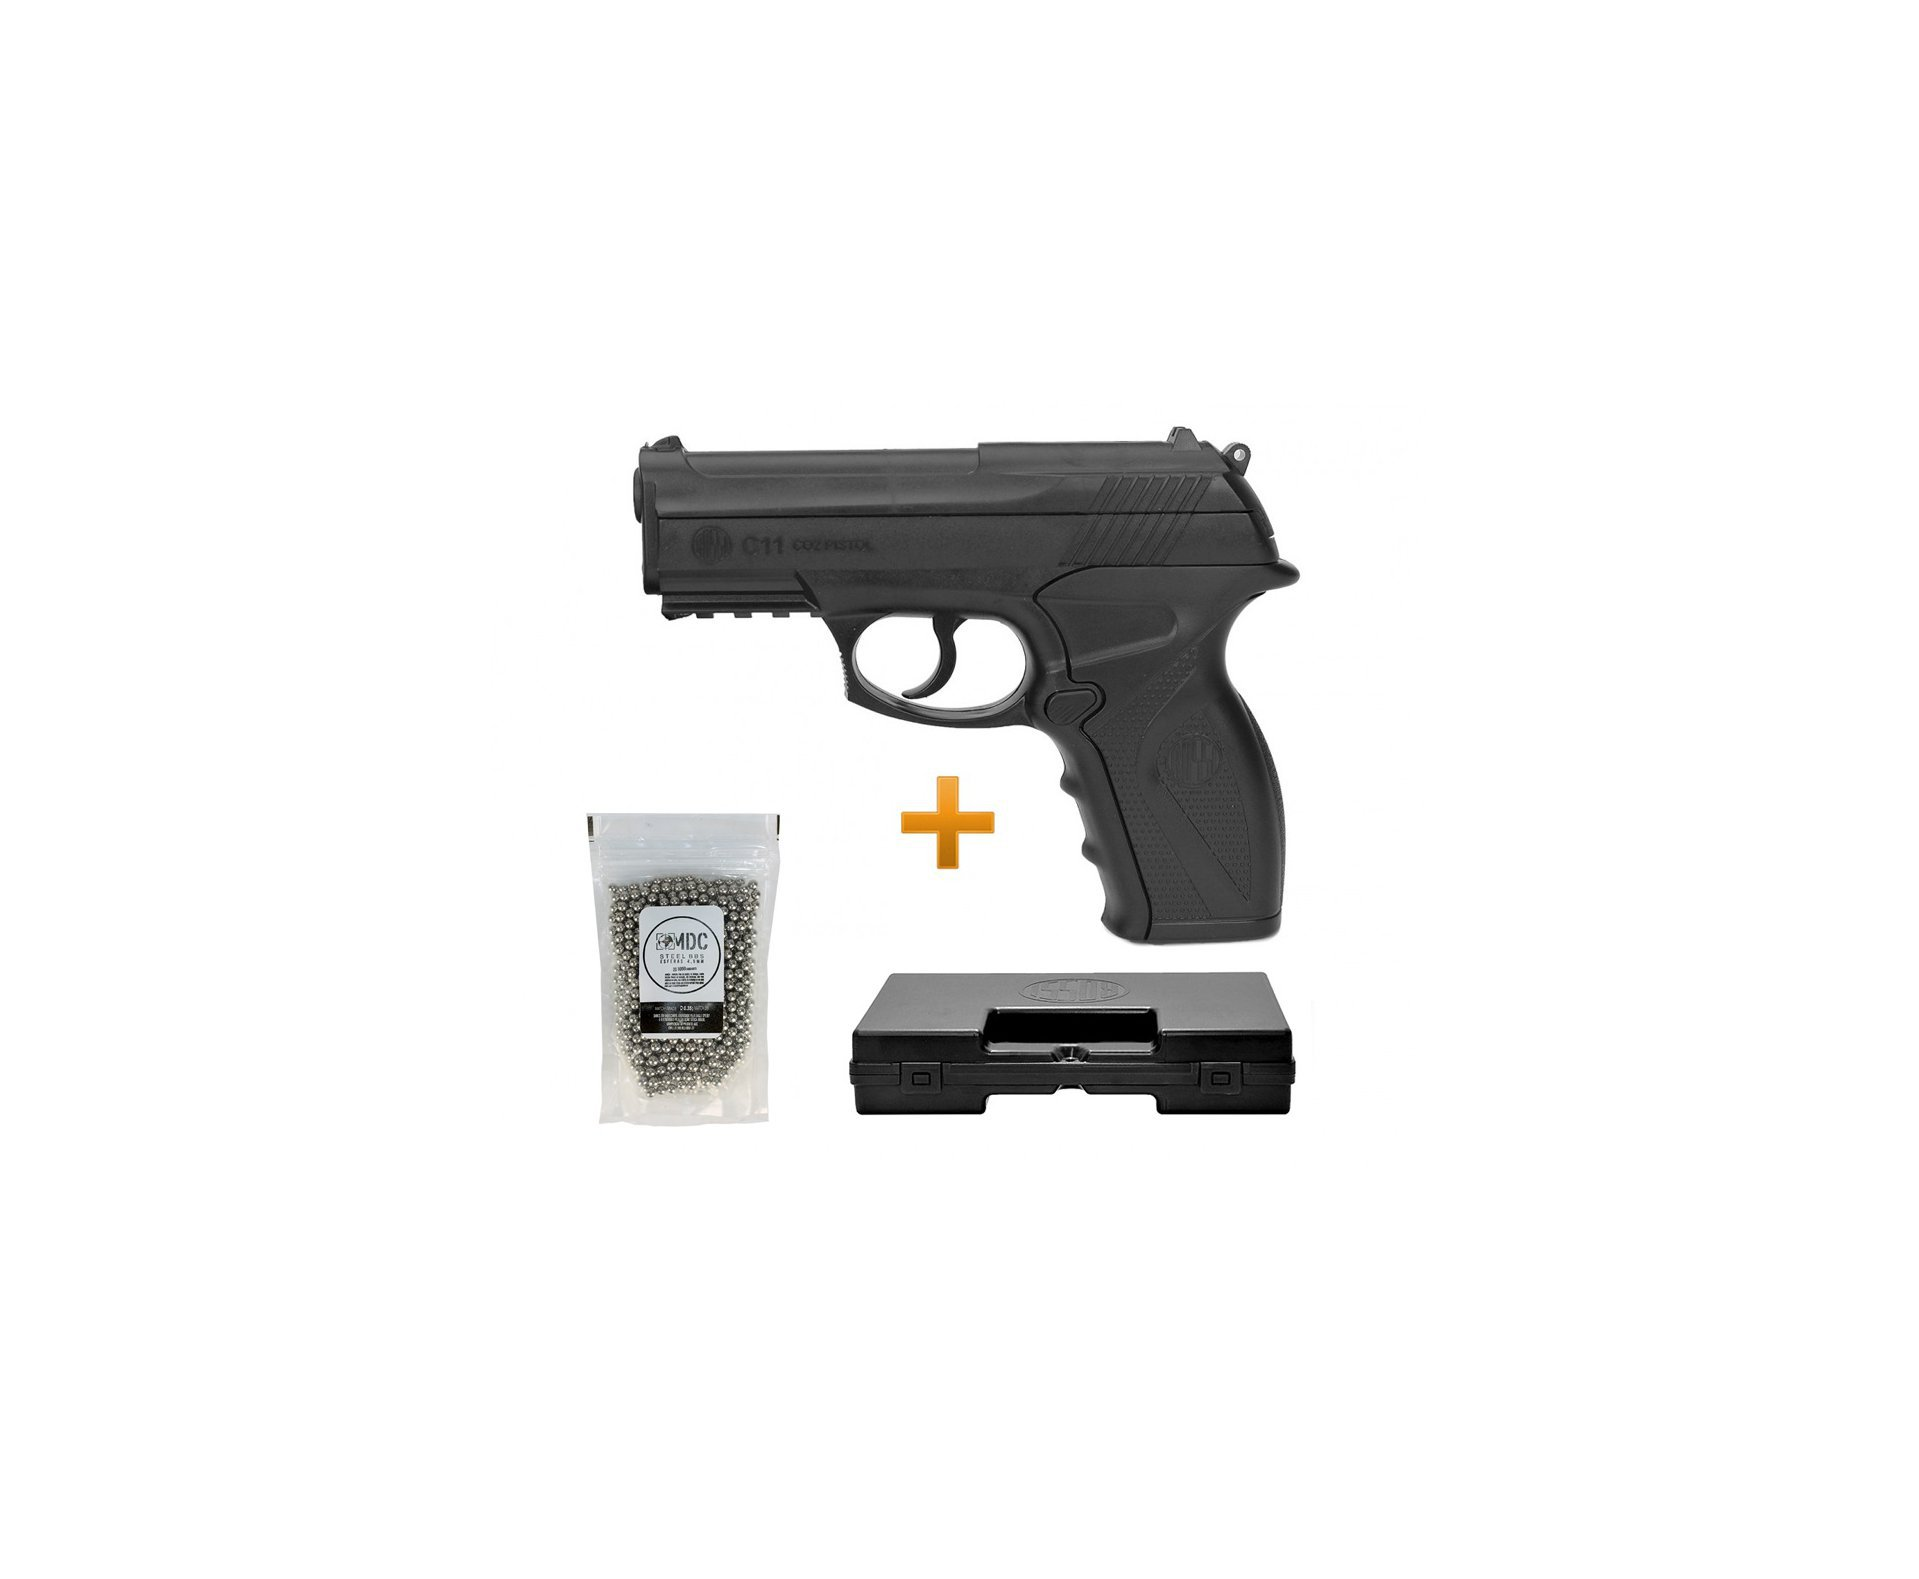 Pistola Pressão Gas Co2 Wg C11 Polímero 4,5 + Esferas Aço De 4,5mm + Case